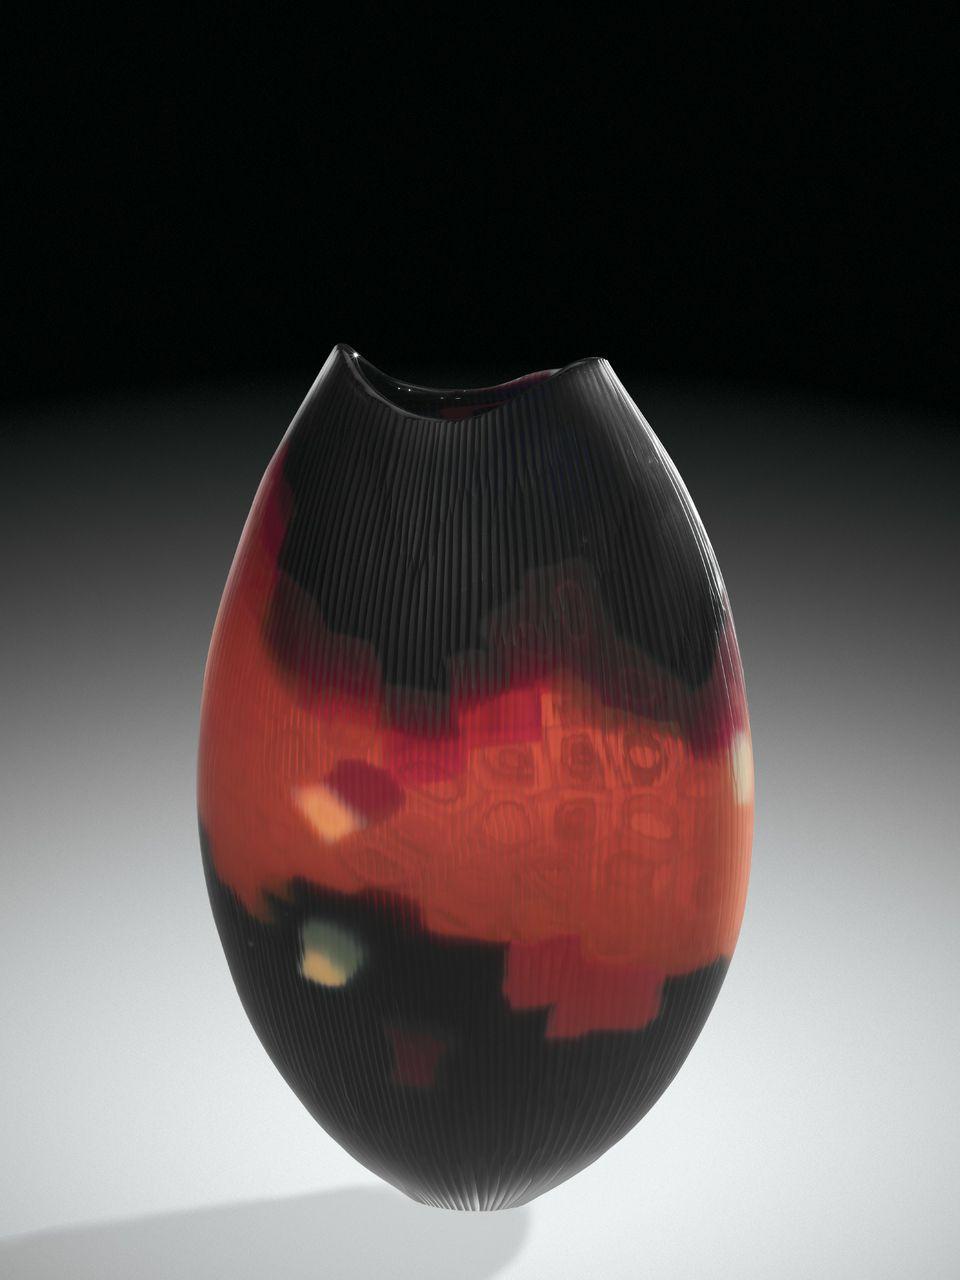 Stromboli HG921 by Lino Tagliapietra